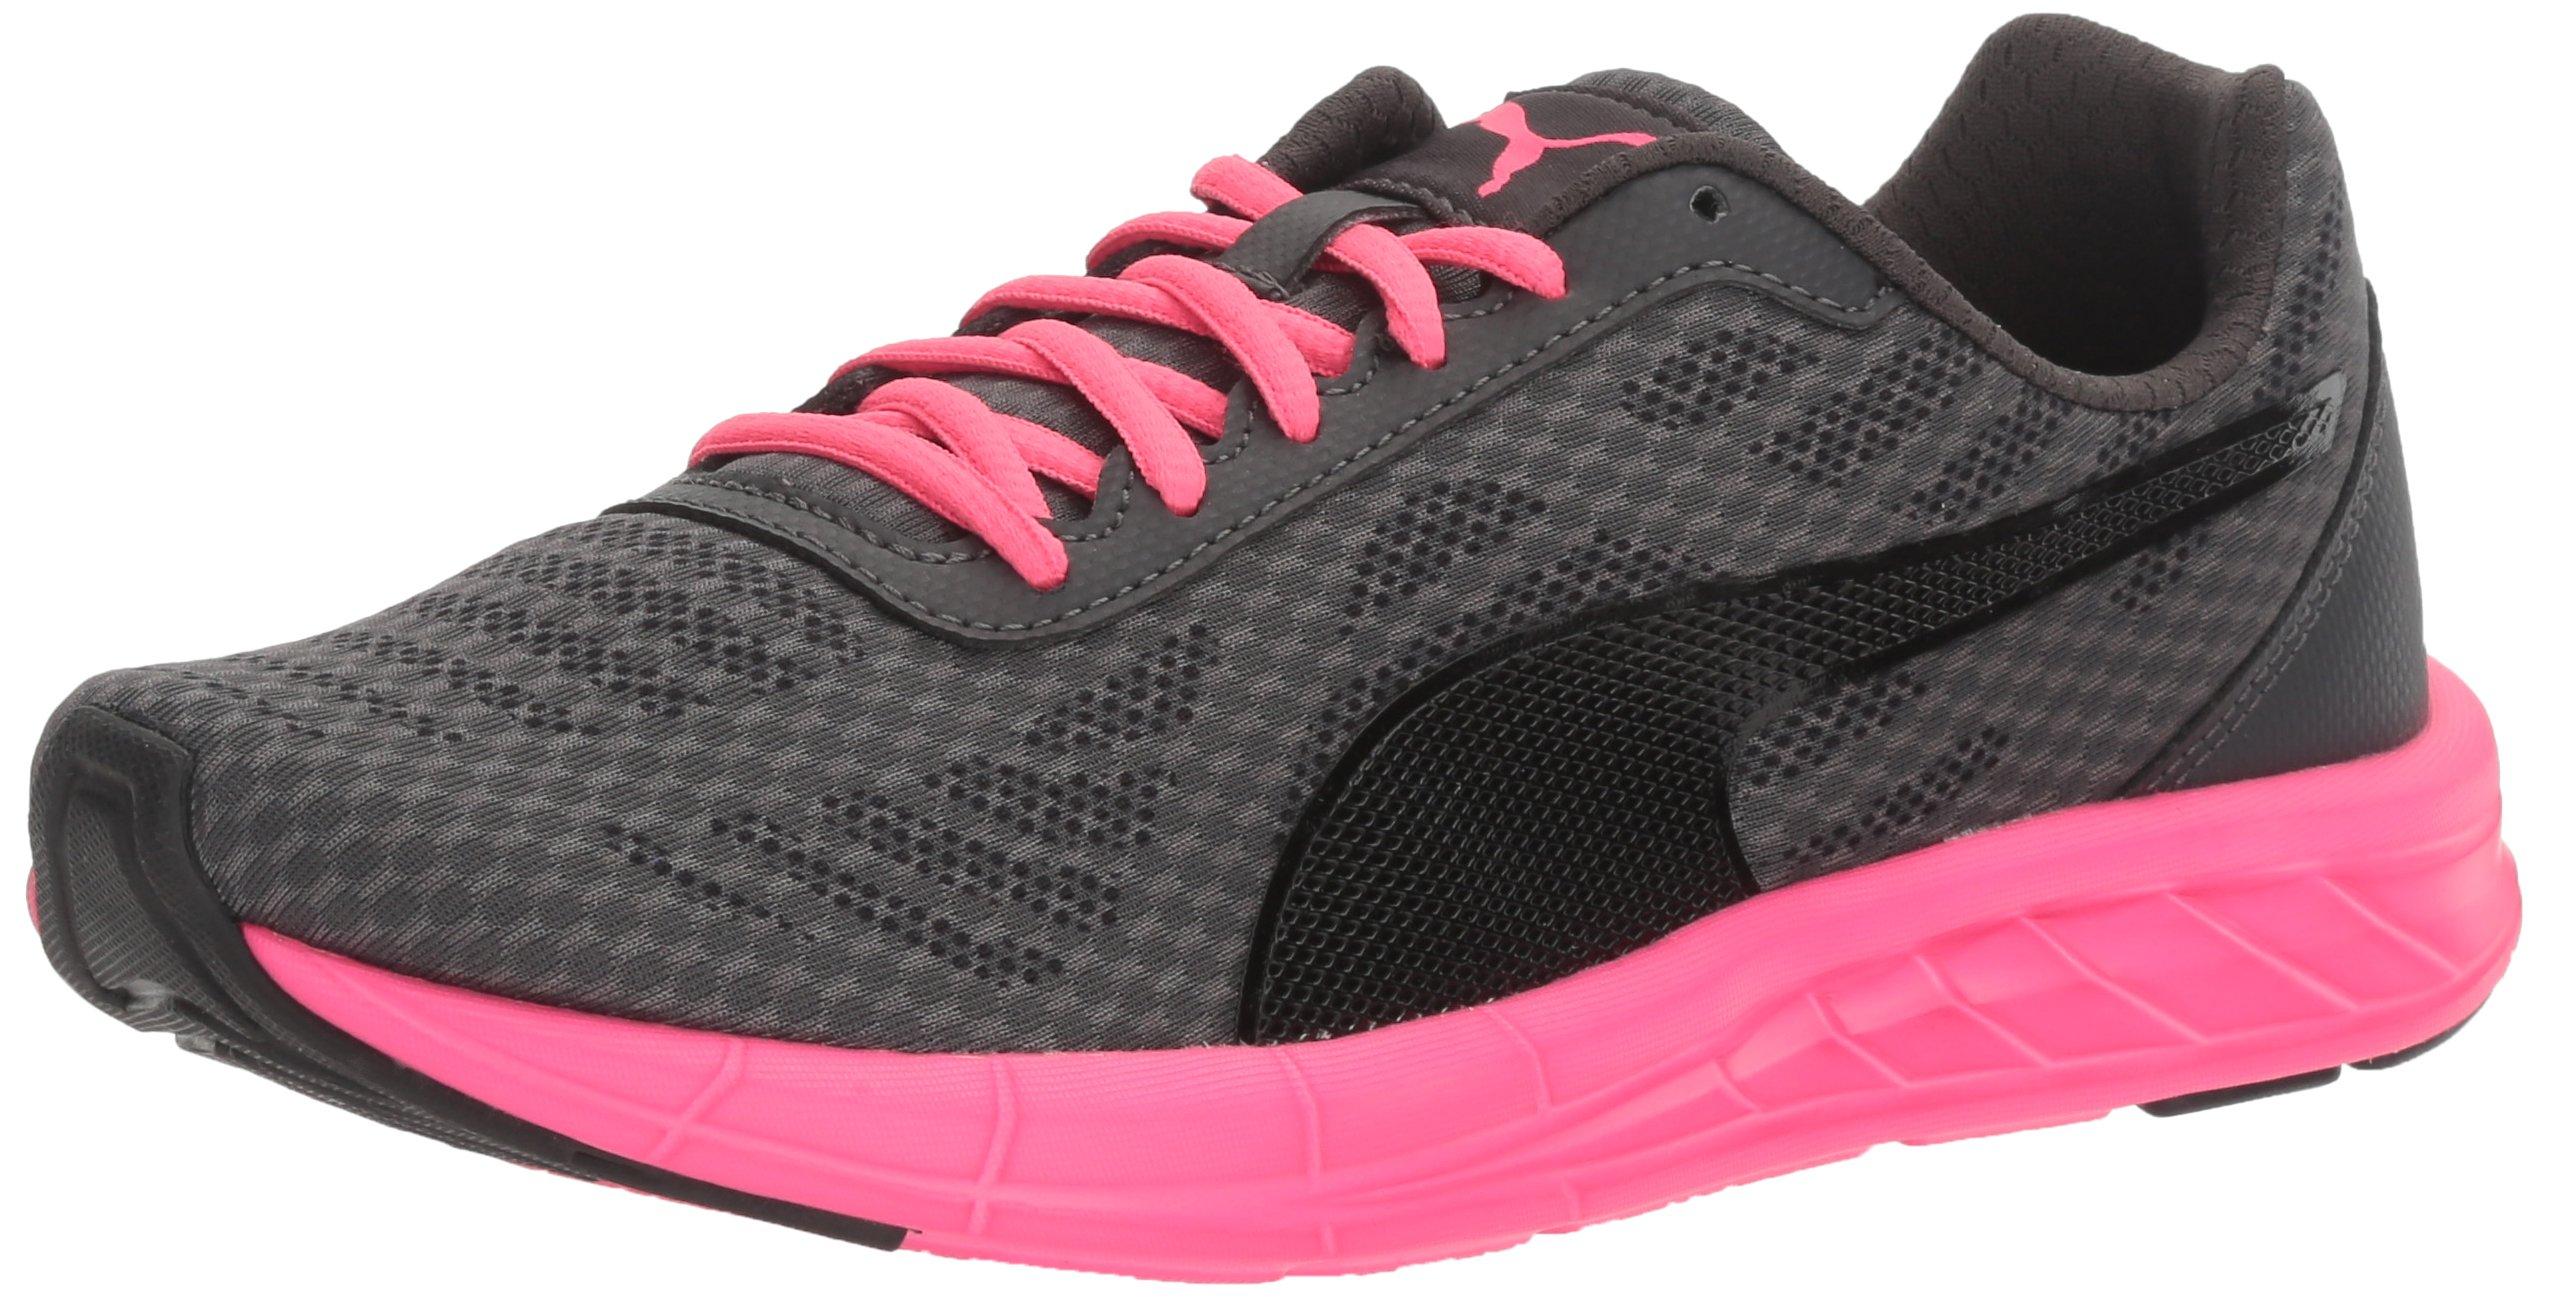 PUMA Women's Meteor Wn's Cross-Trainer Shoe, Black-Asphalt-Knockout Pink, 8.5 M US